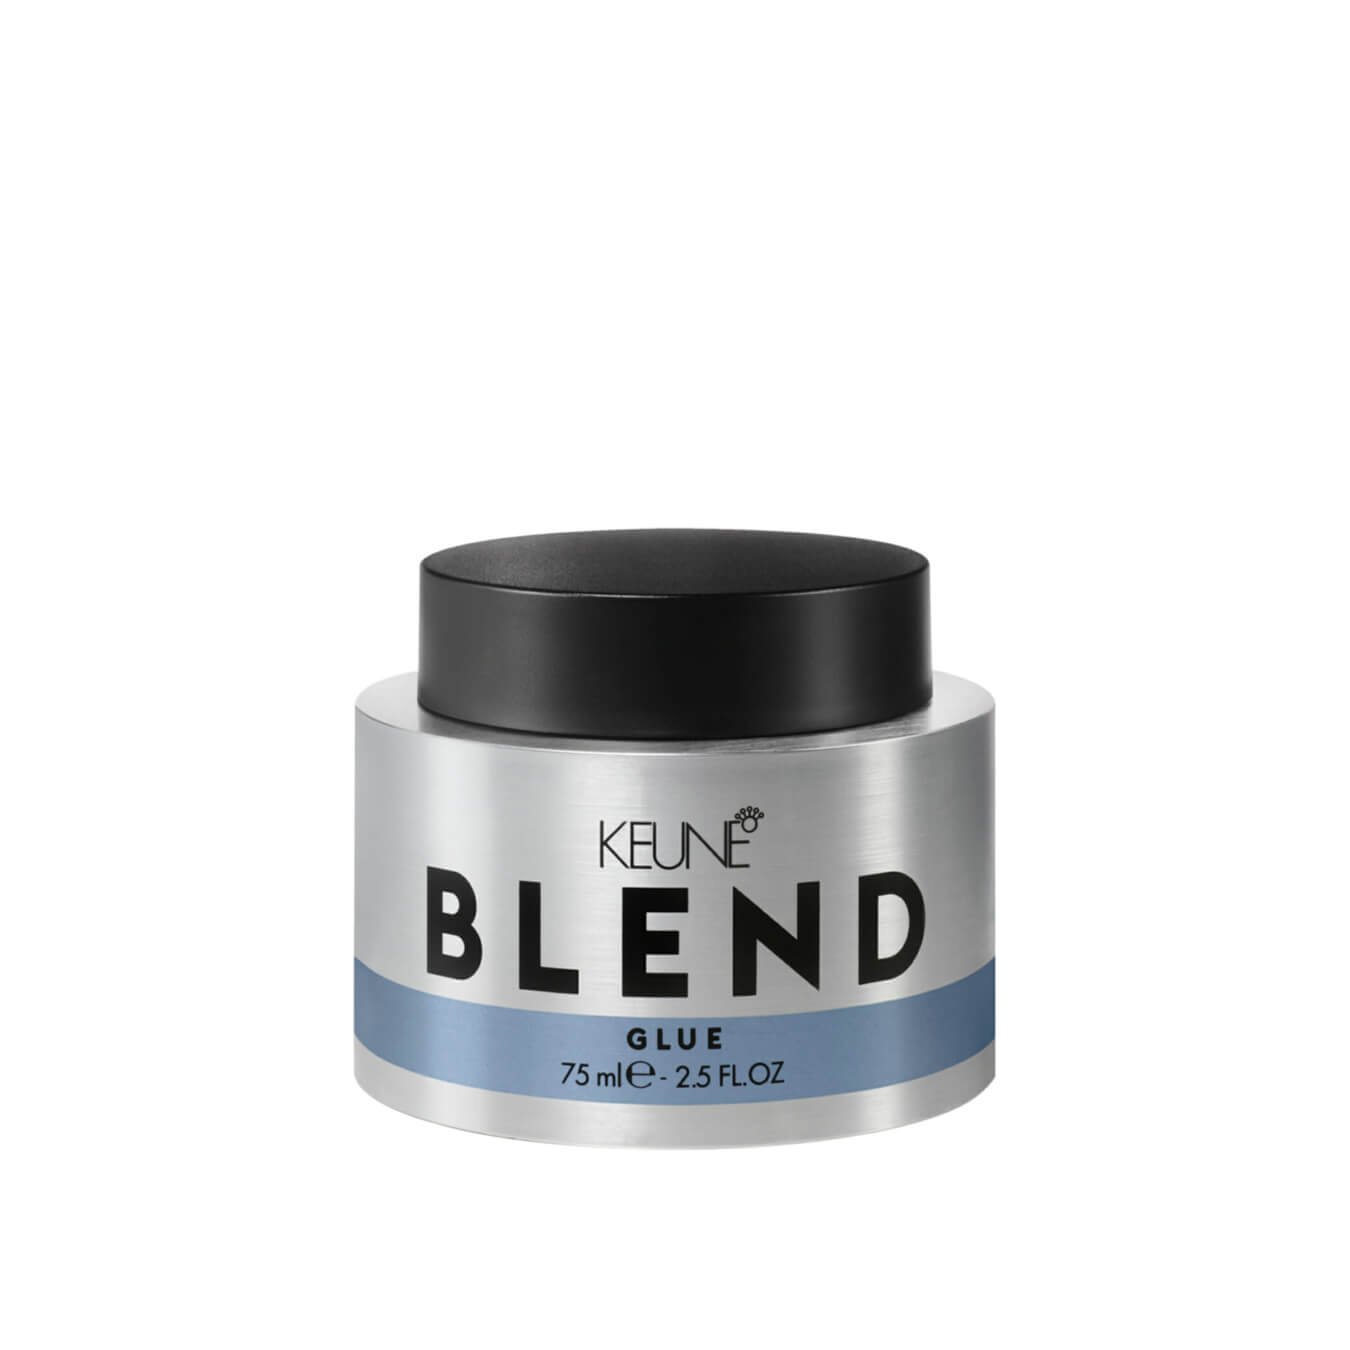 Kauf Keune Blend Glue 75ml